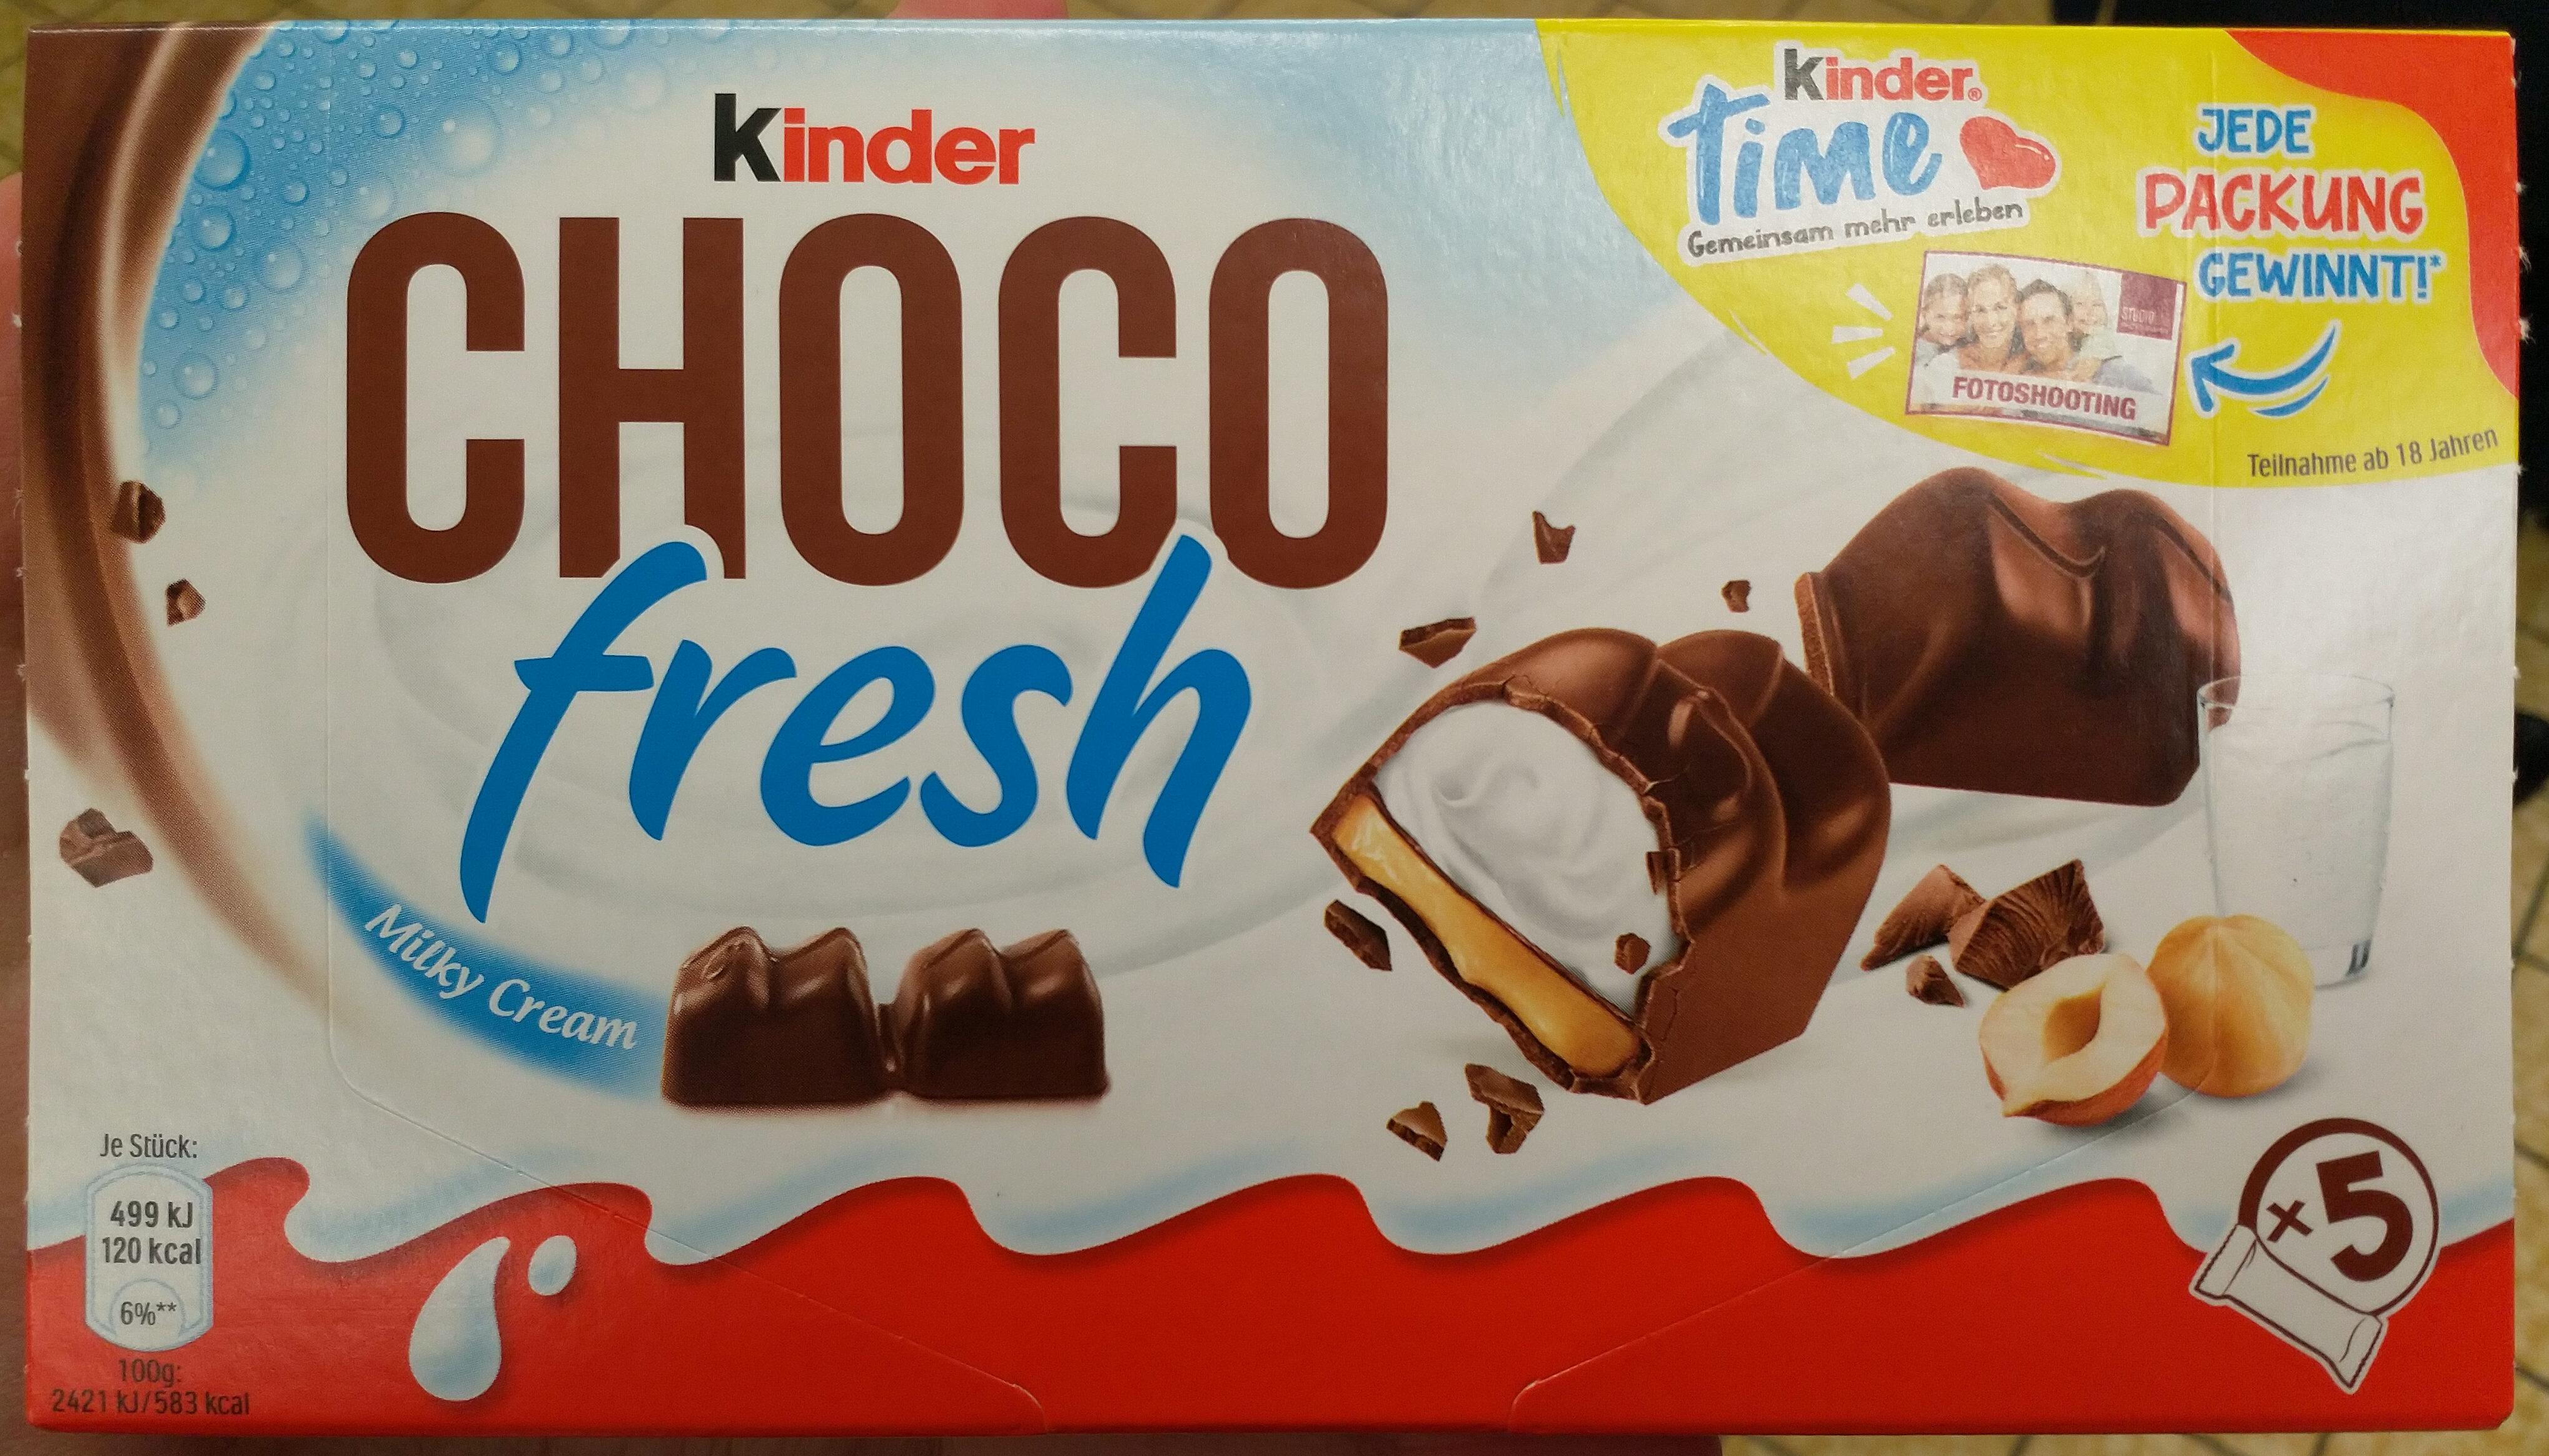 Choco fresh - Product - de